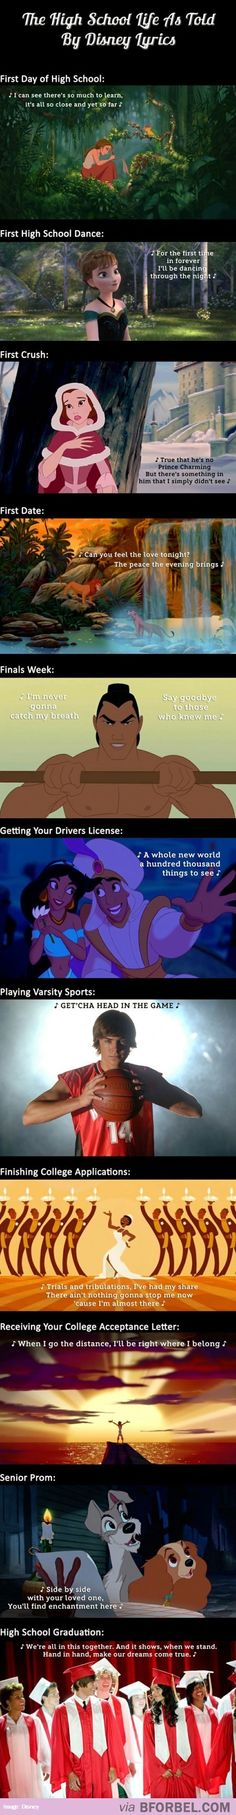 High School Life Told By Disney Lyrics… bforbel.com